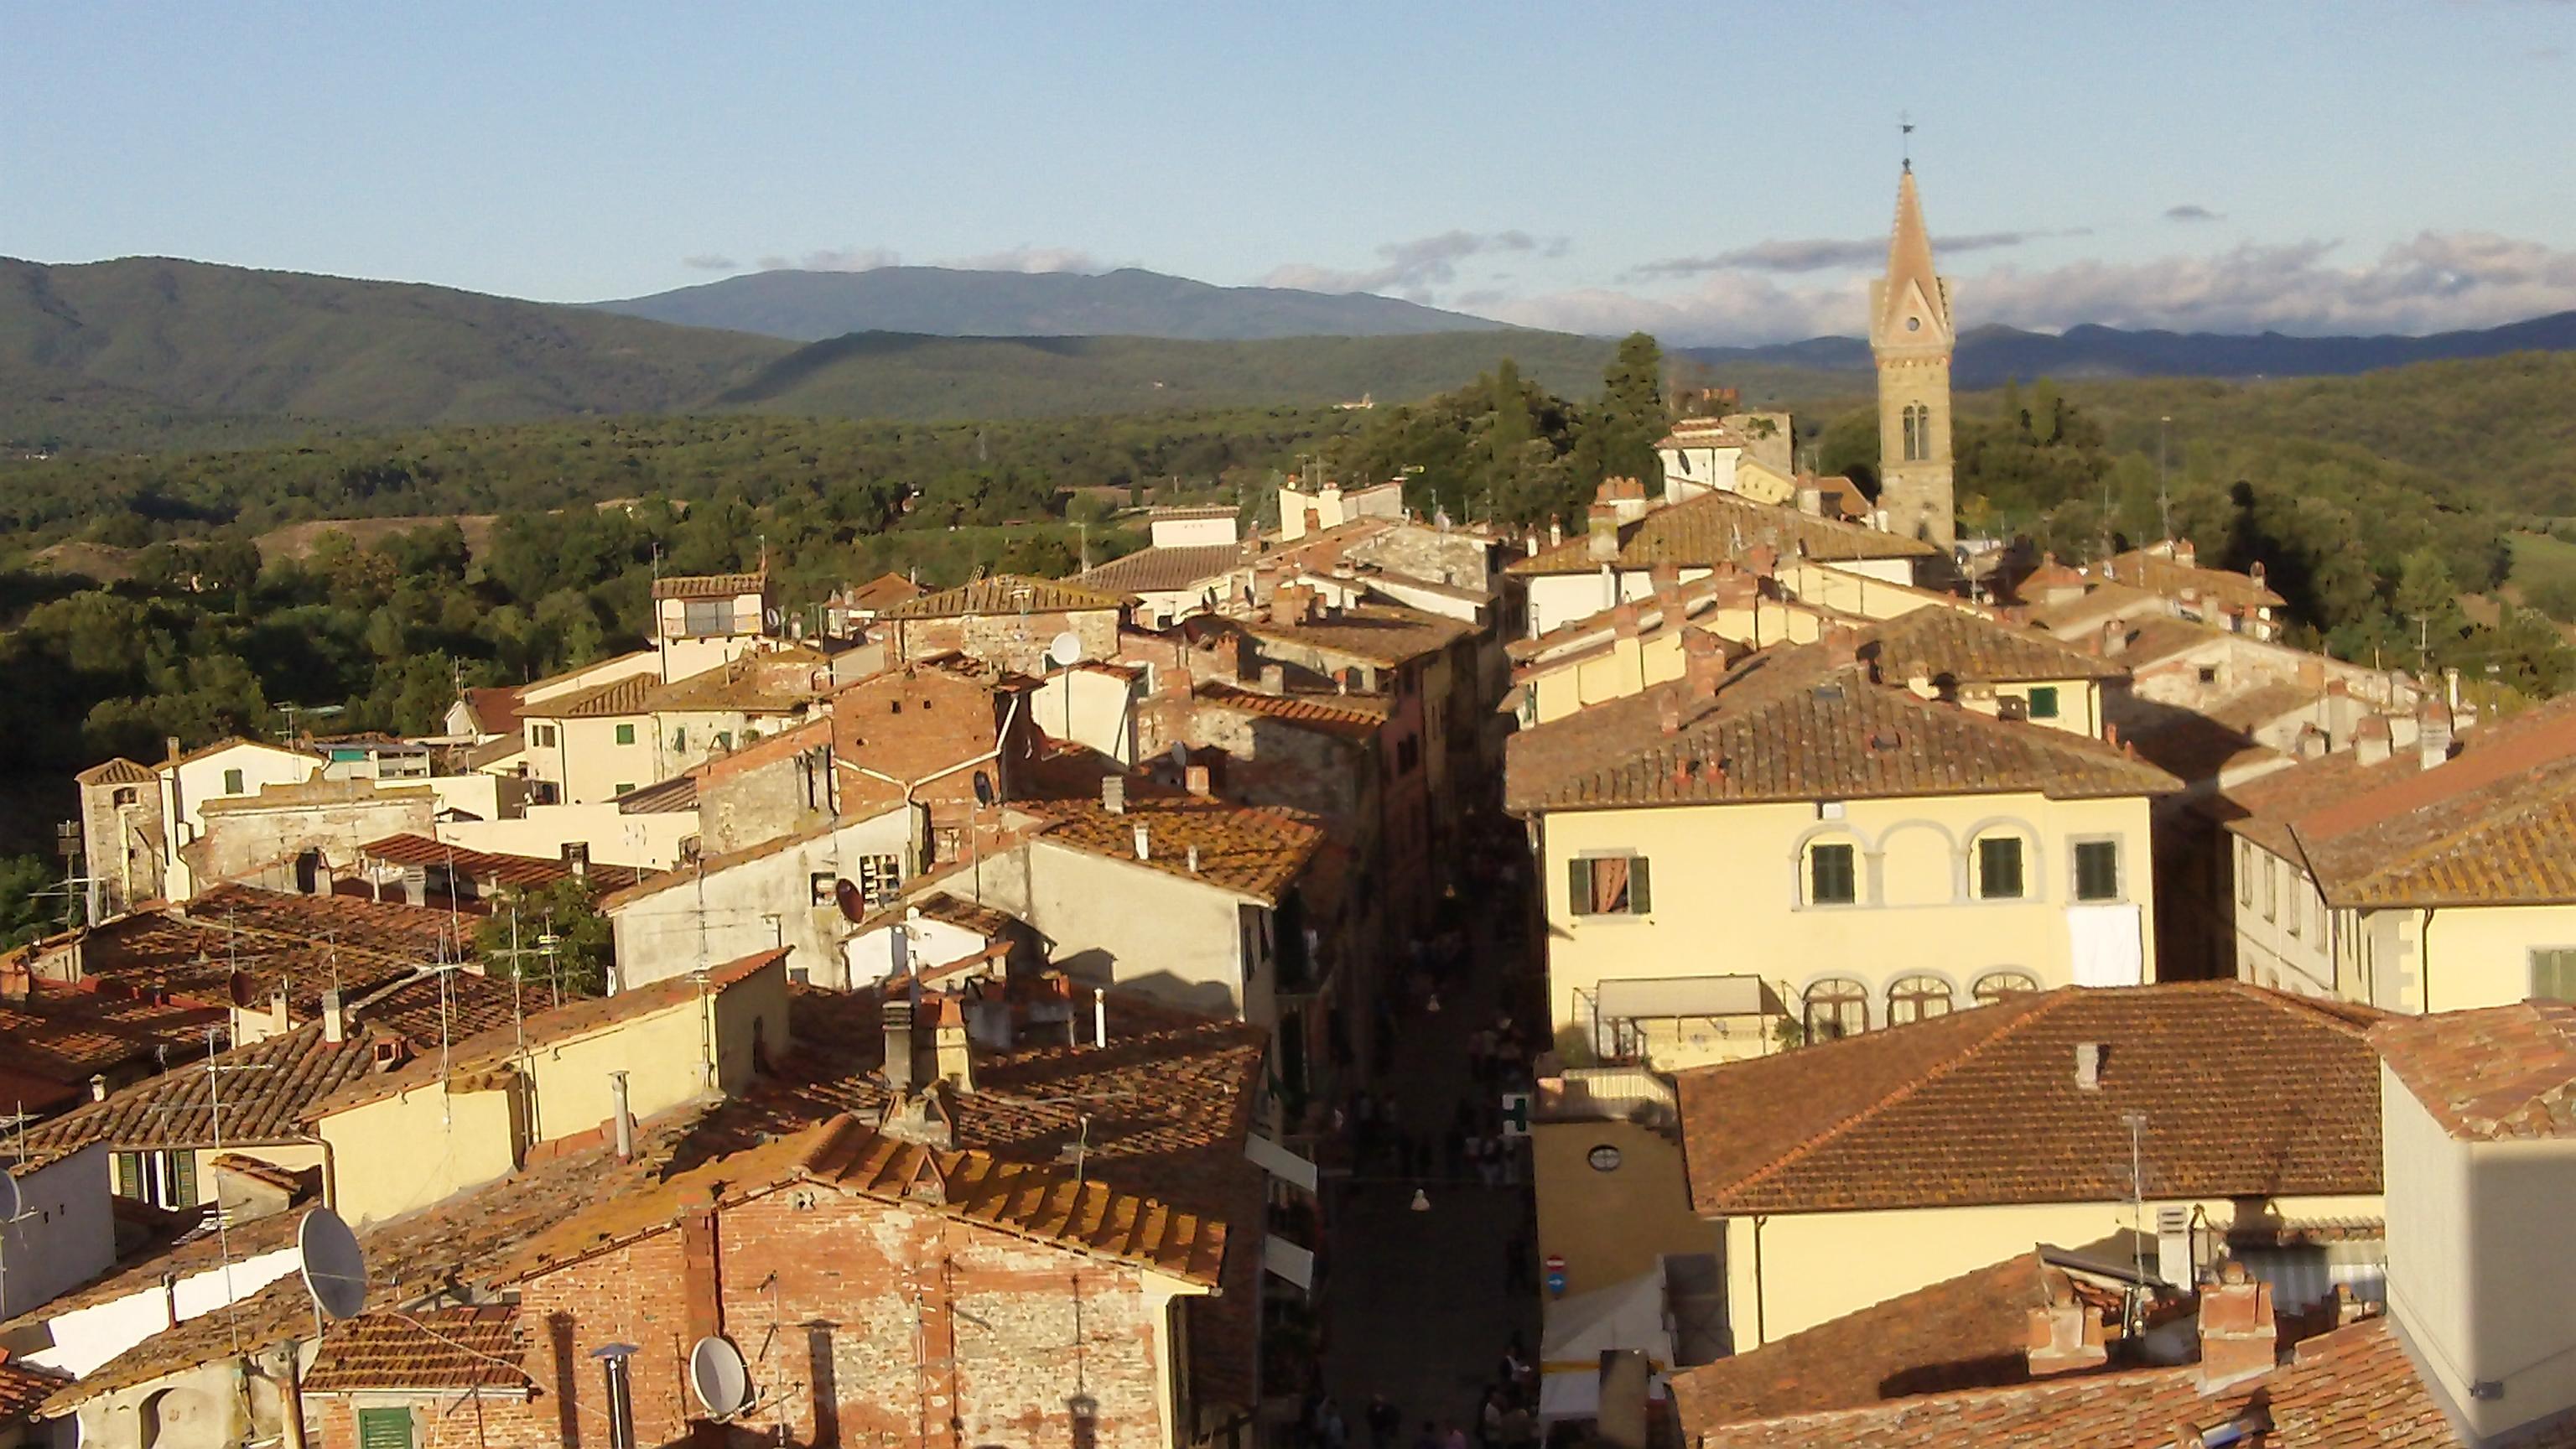 Borgo Santa Maria in Valle